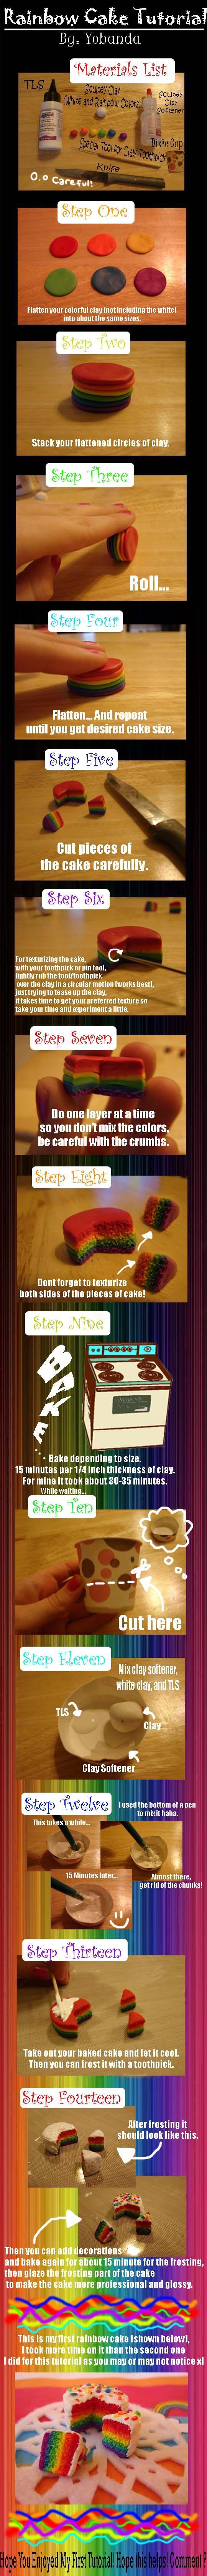 Miniature Clay Rainbow Cake Tutorial I made.    Find my other clay works on my website : yobanda.deviantar... and on sale here : www.etsy.com/.... Follow my instragram @Emma Goebel too!